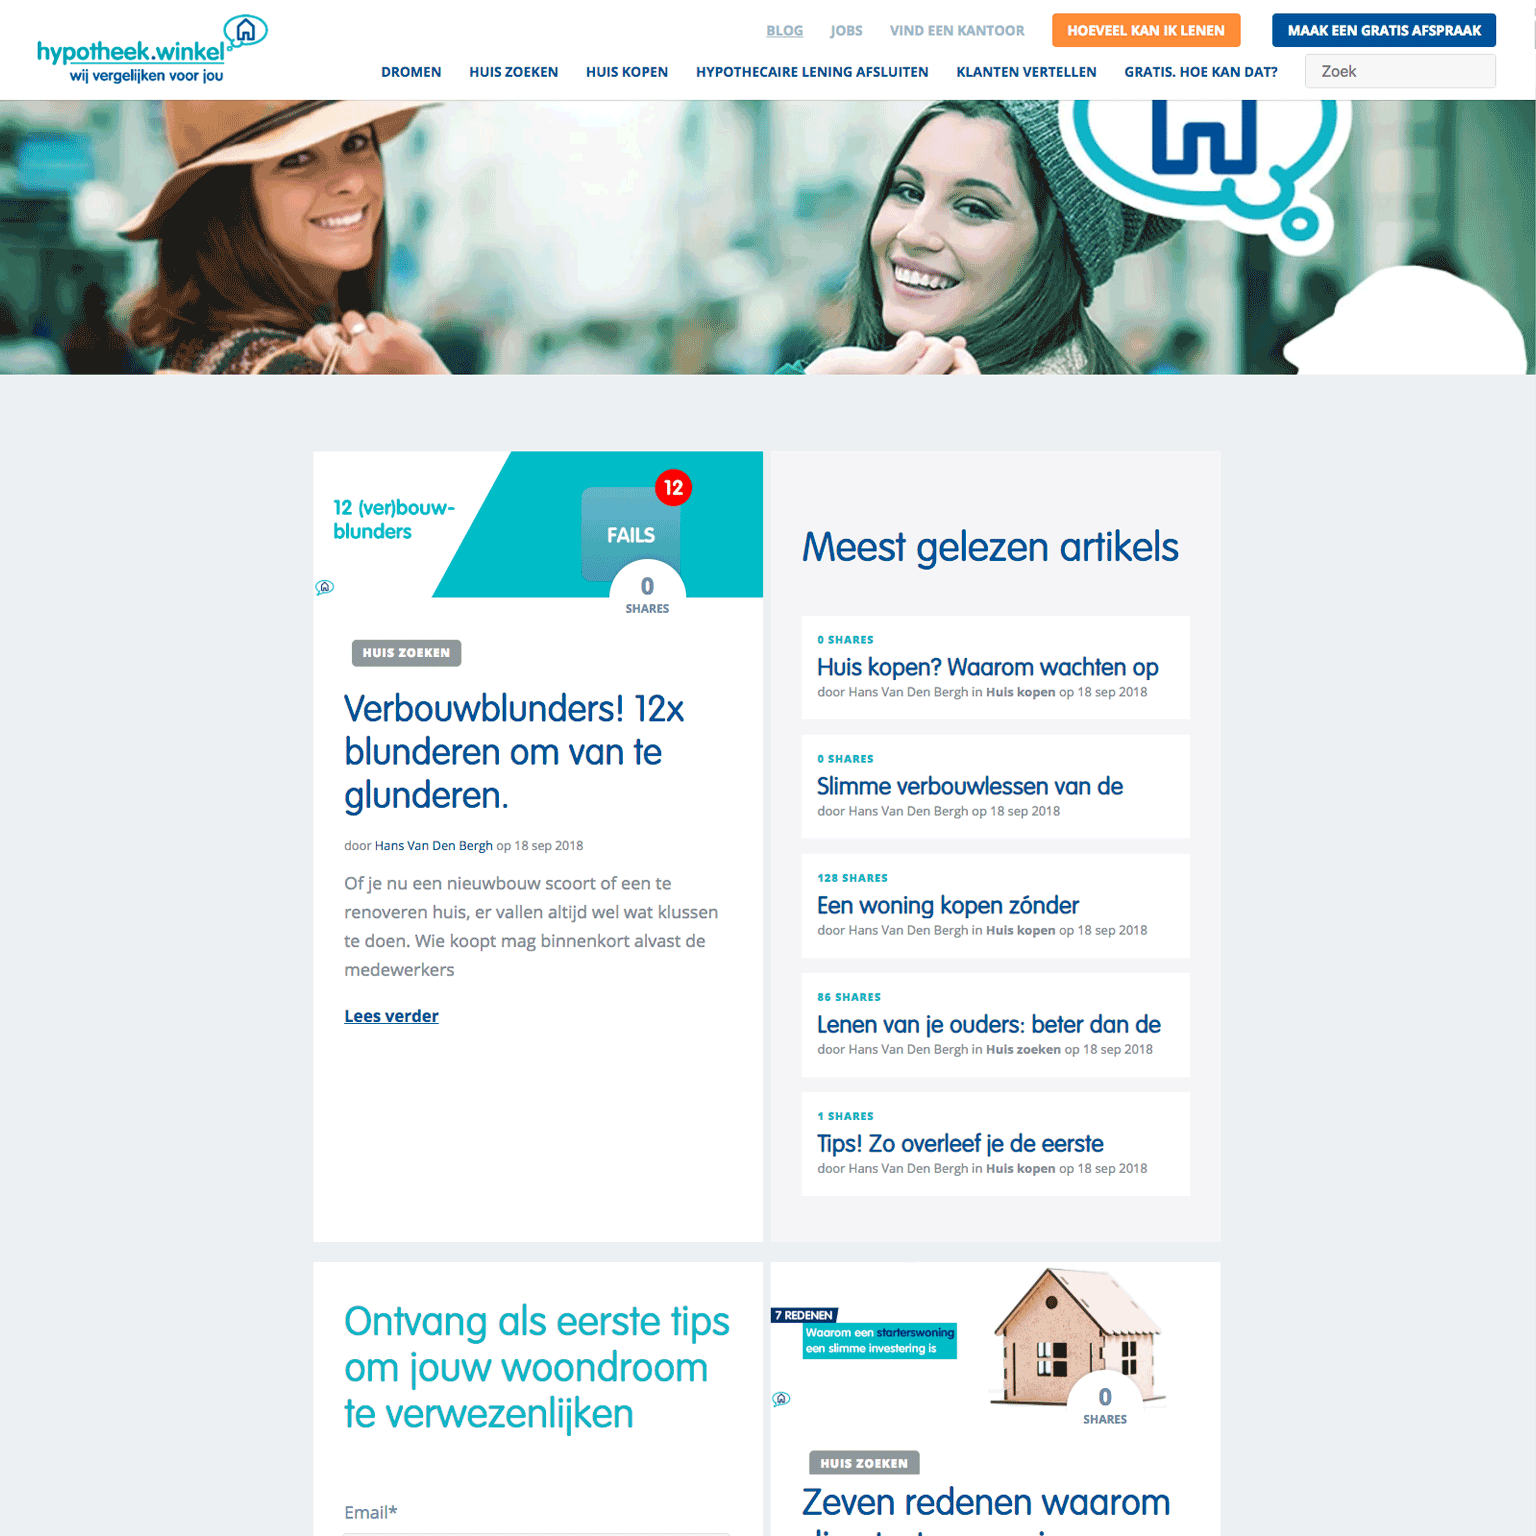 1536x1536-case-study-hypotheekwinkel-blog-page